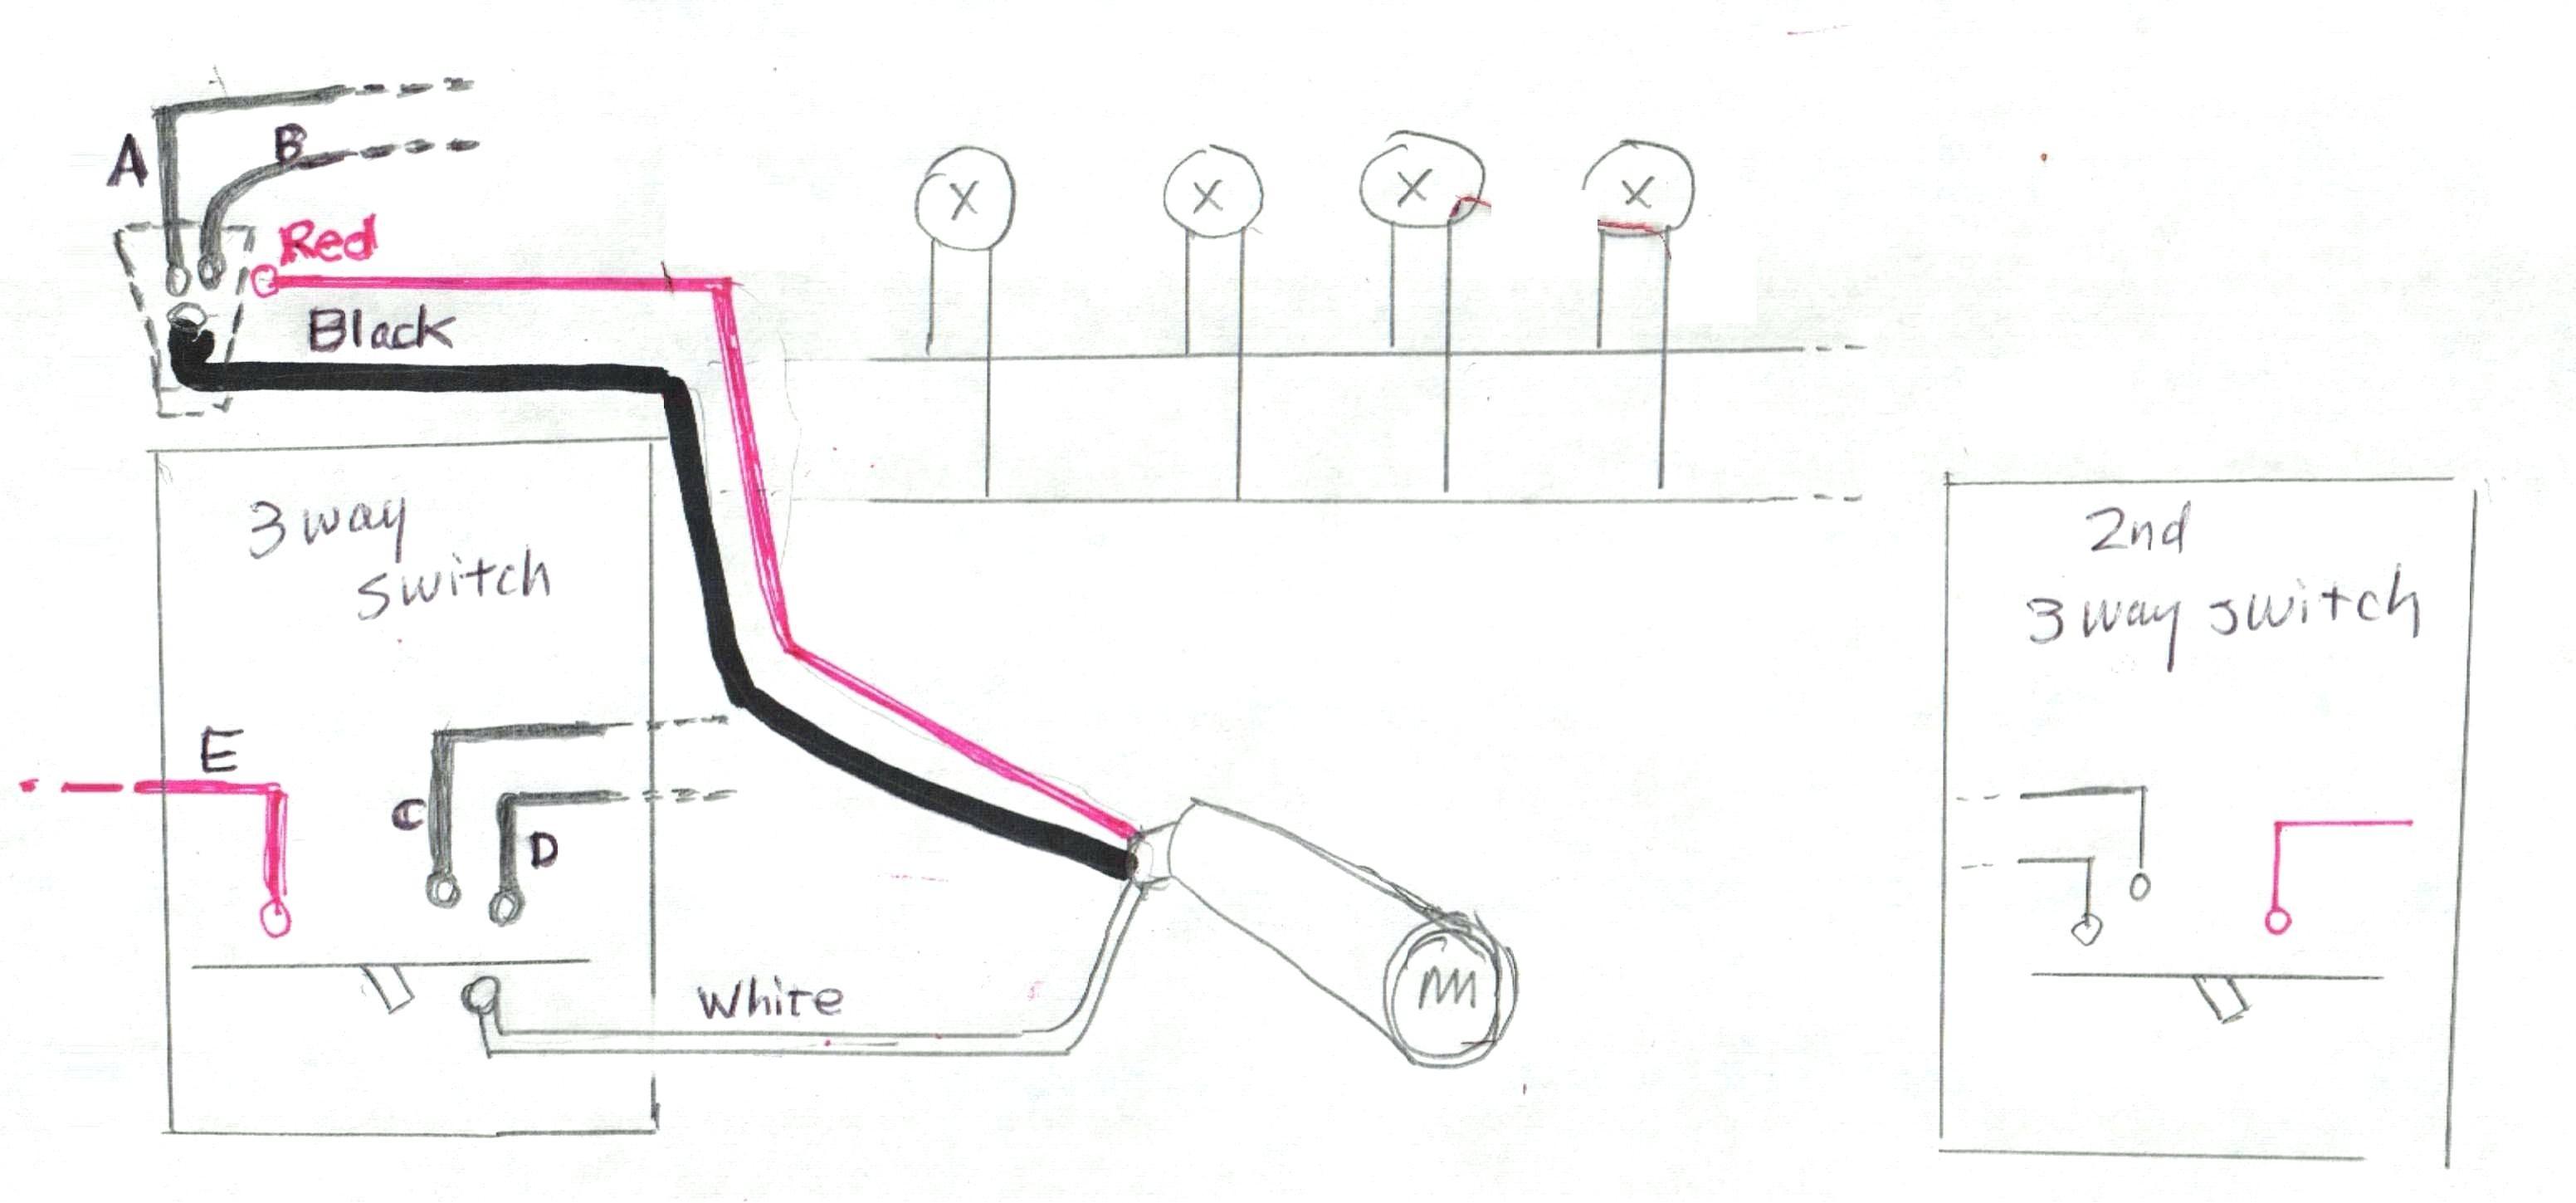 Bmw R90 Wiring Diagram Libraries Cb750 R60 Chopper 1974 2002 Auto Wire Simple Diagrambmw Library